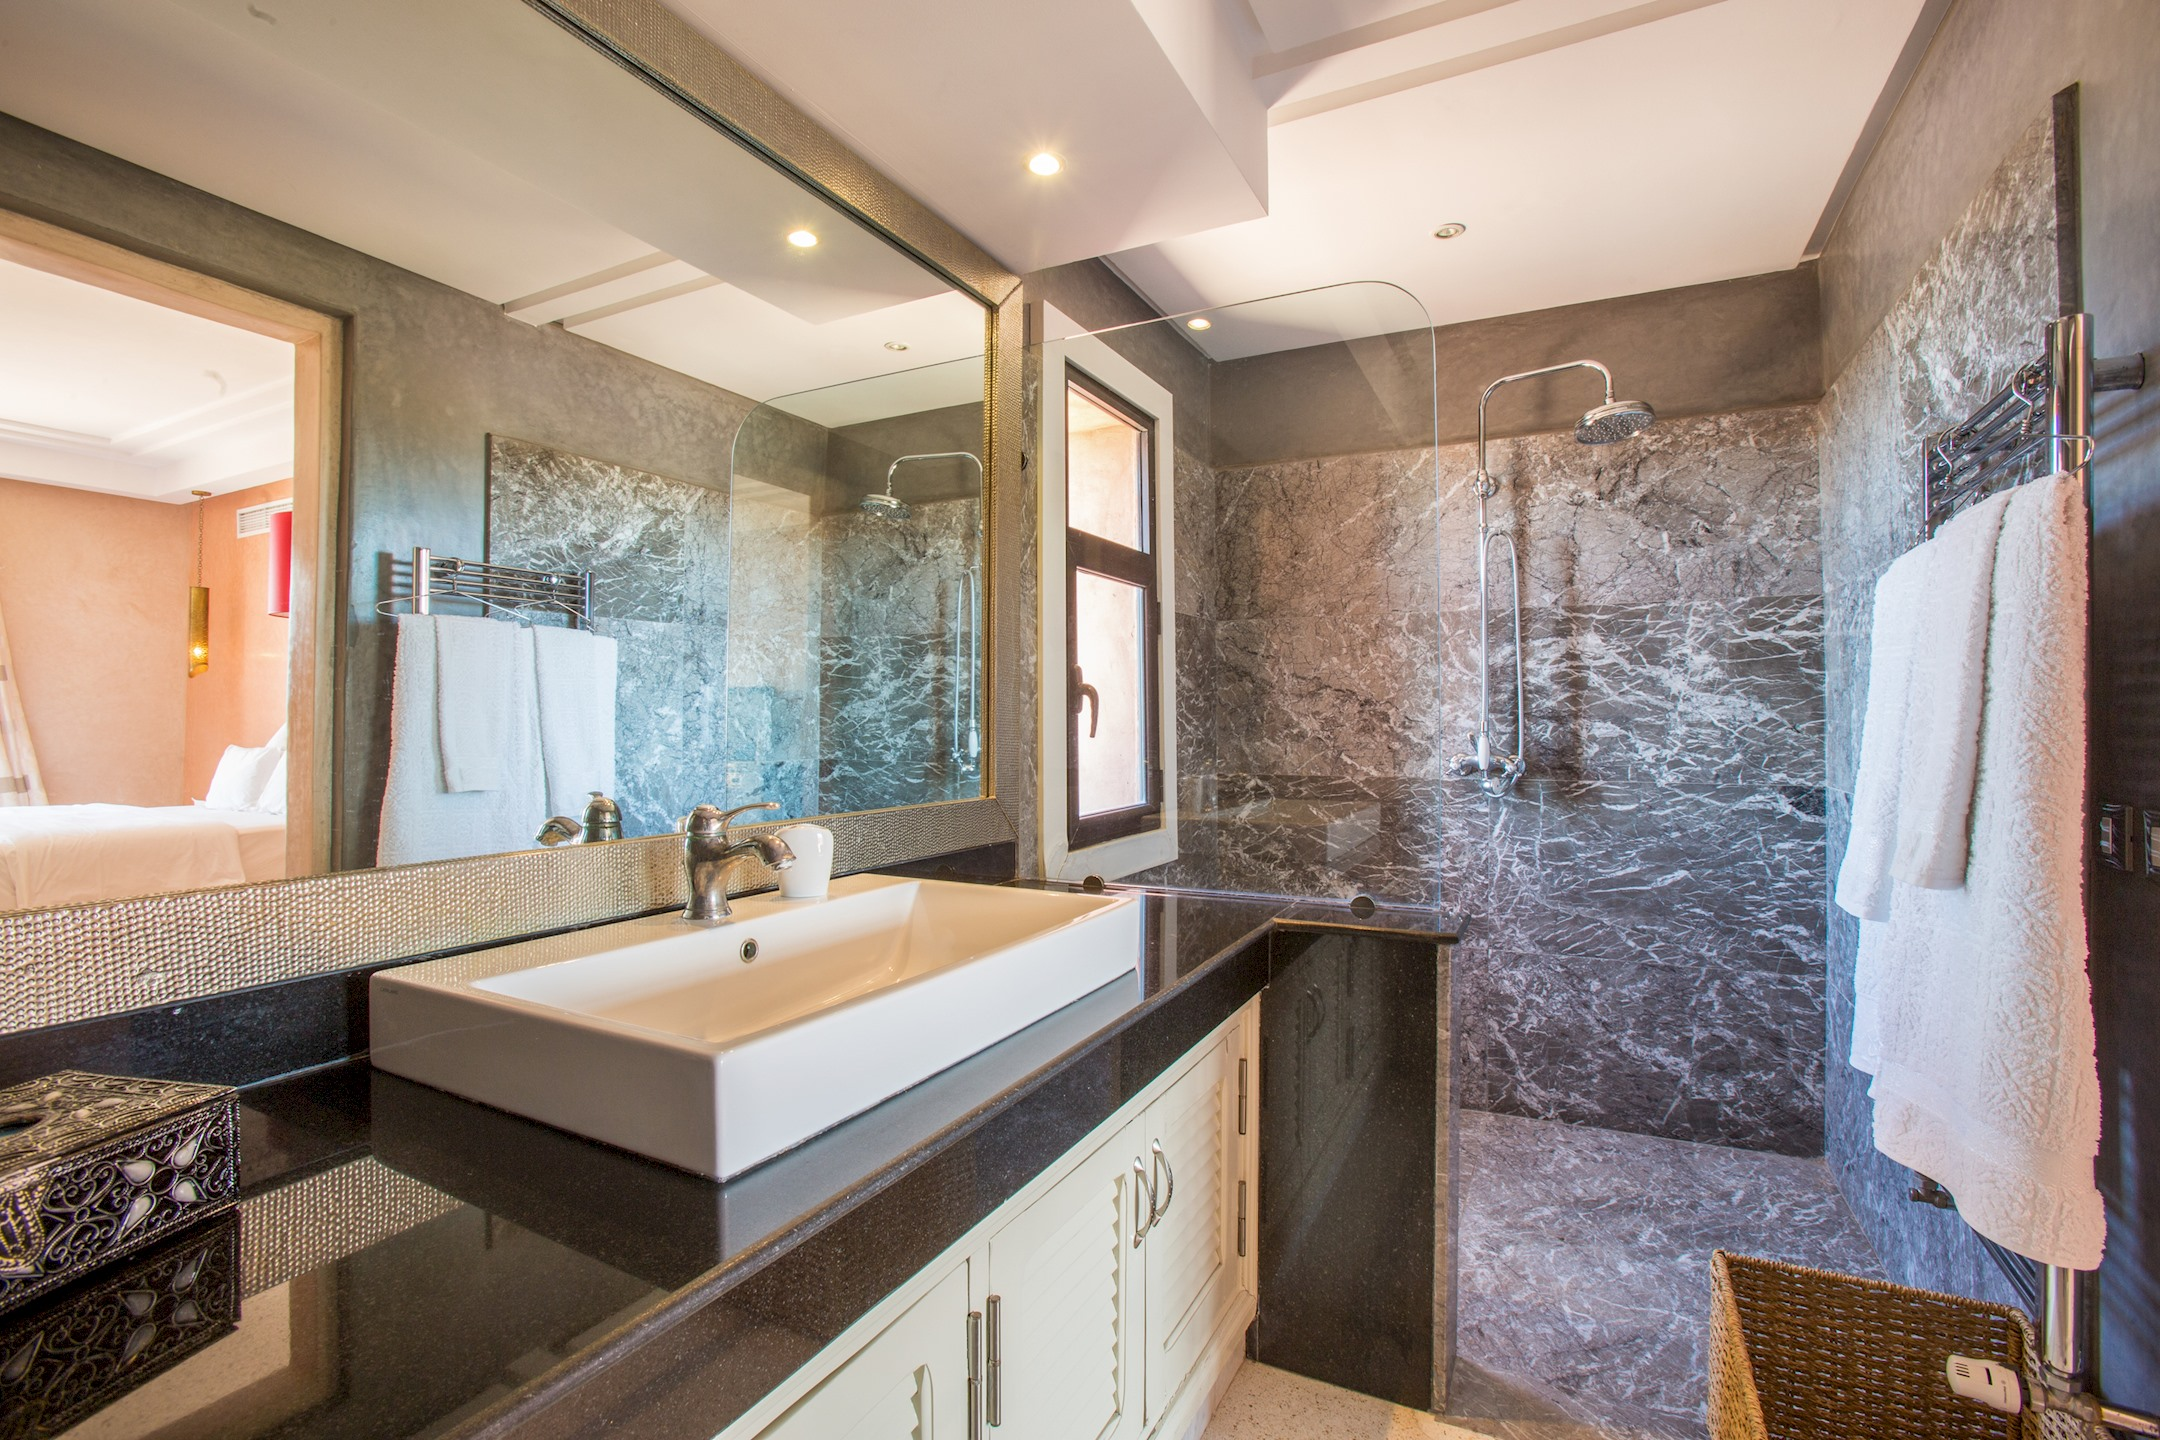 Apartment VILLA KOUTOUBIA - PISCINE CHAUFFEE  HAMMAM  JACUZZI  PETIT-DEJEUNER A MARRAKECH photo 20295931